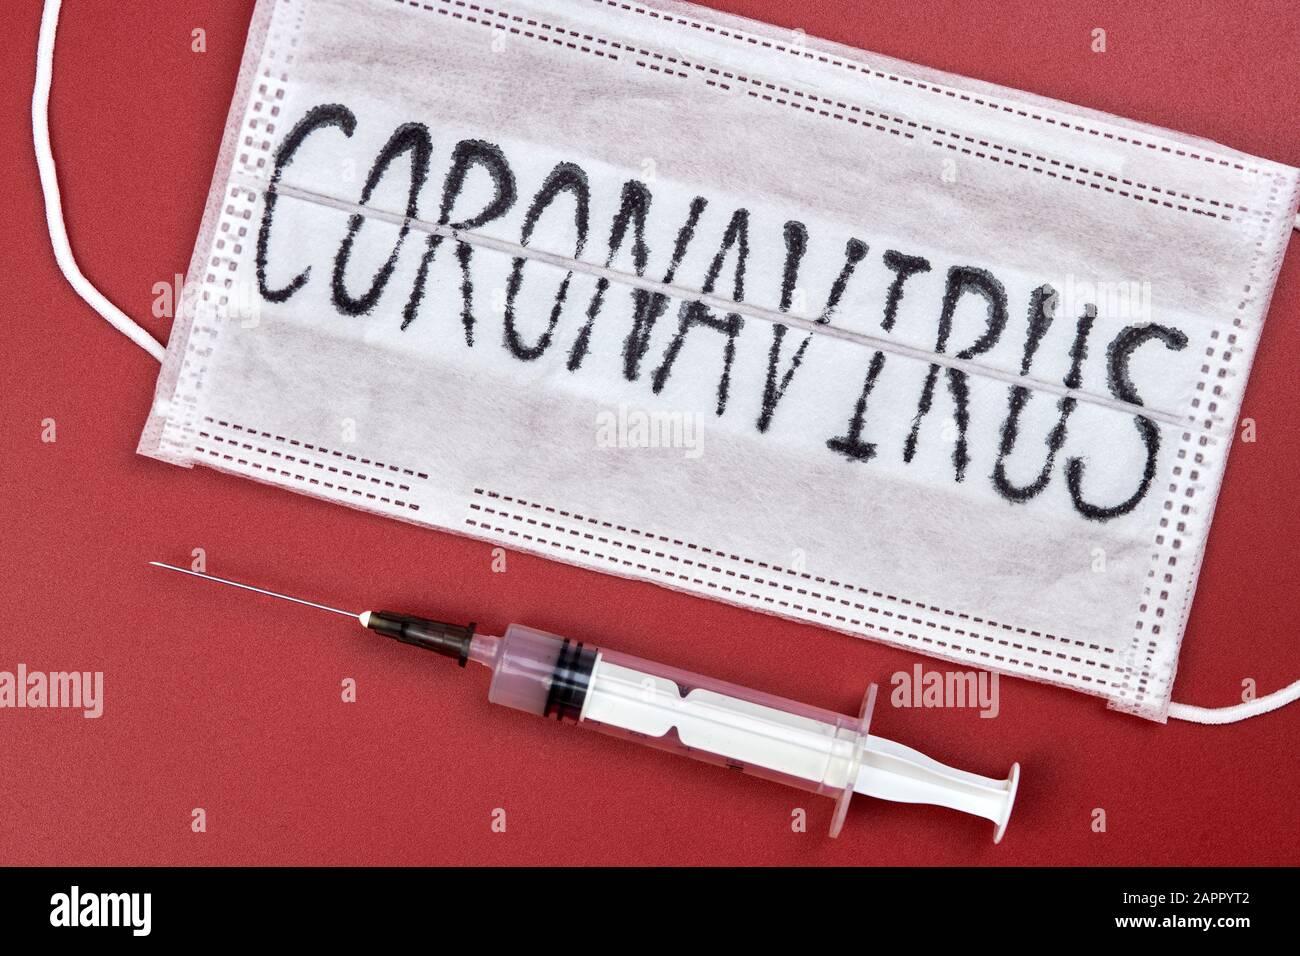 Novel coronavirus - 2019-nCoV, WUHAN virus concept. Surgical mask protective mask with CORONAVIRUS text. Chinese coronavirus outbreak. Red background. Stock Photo